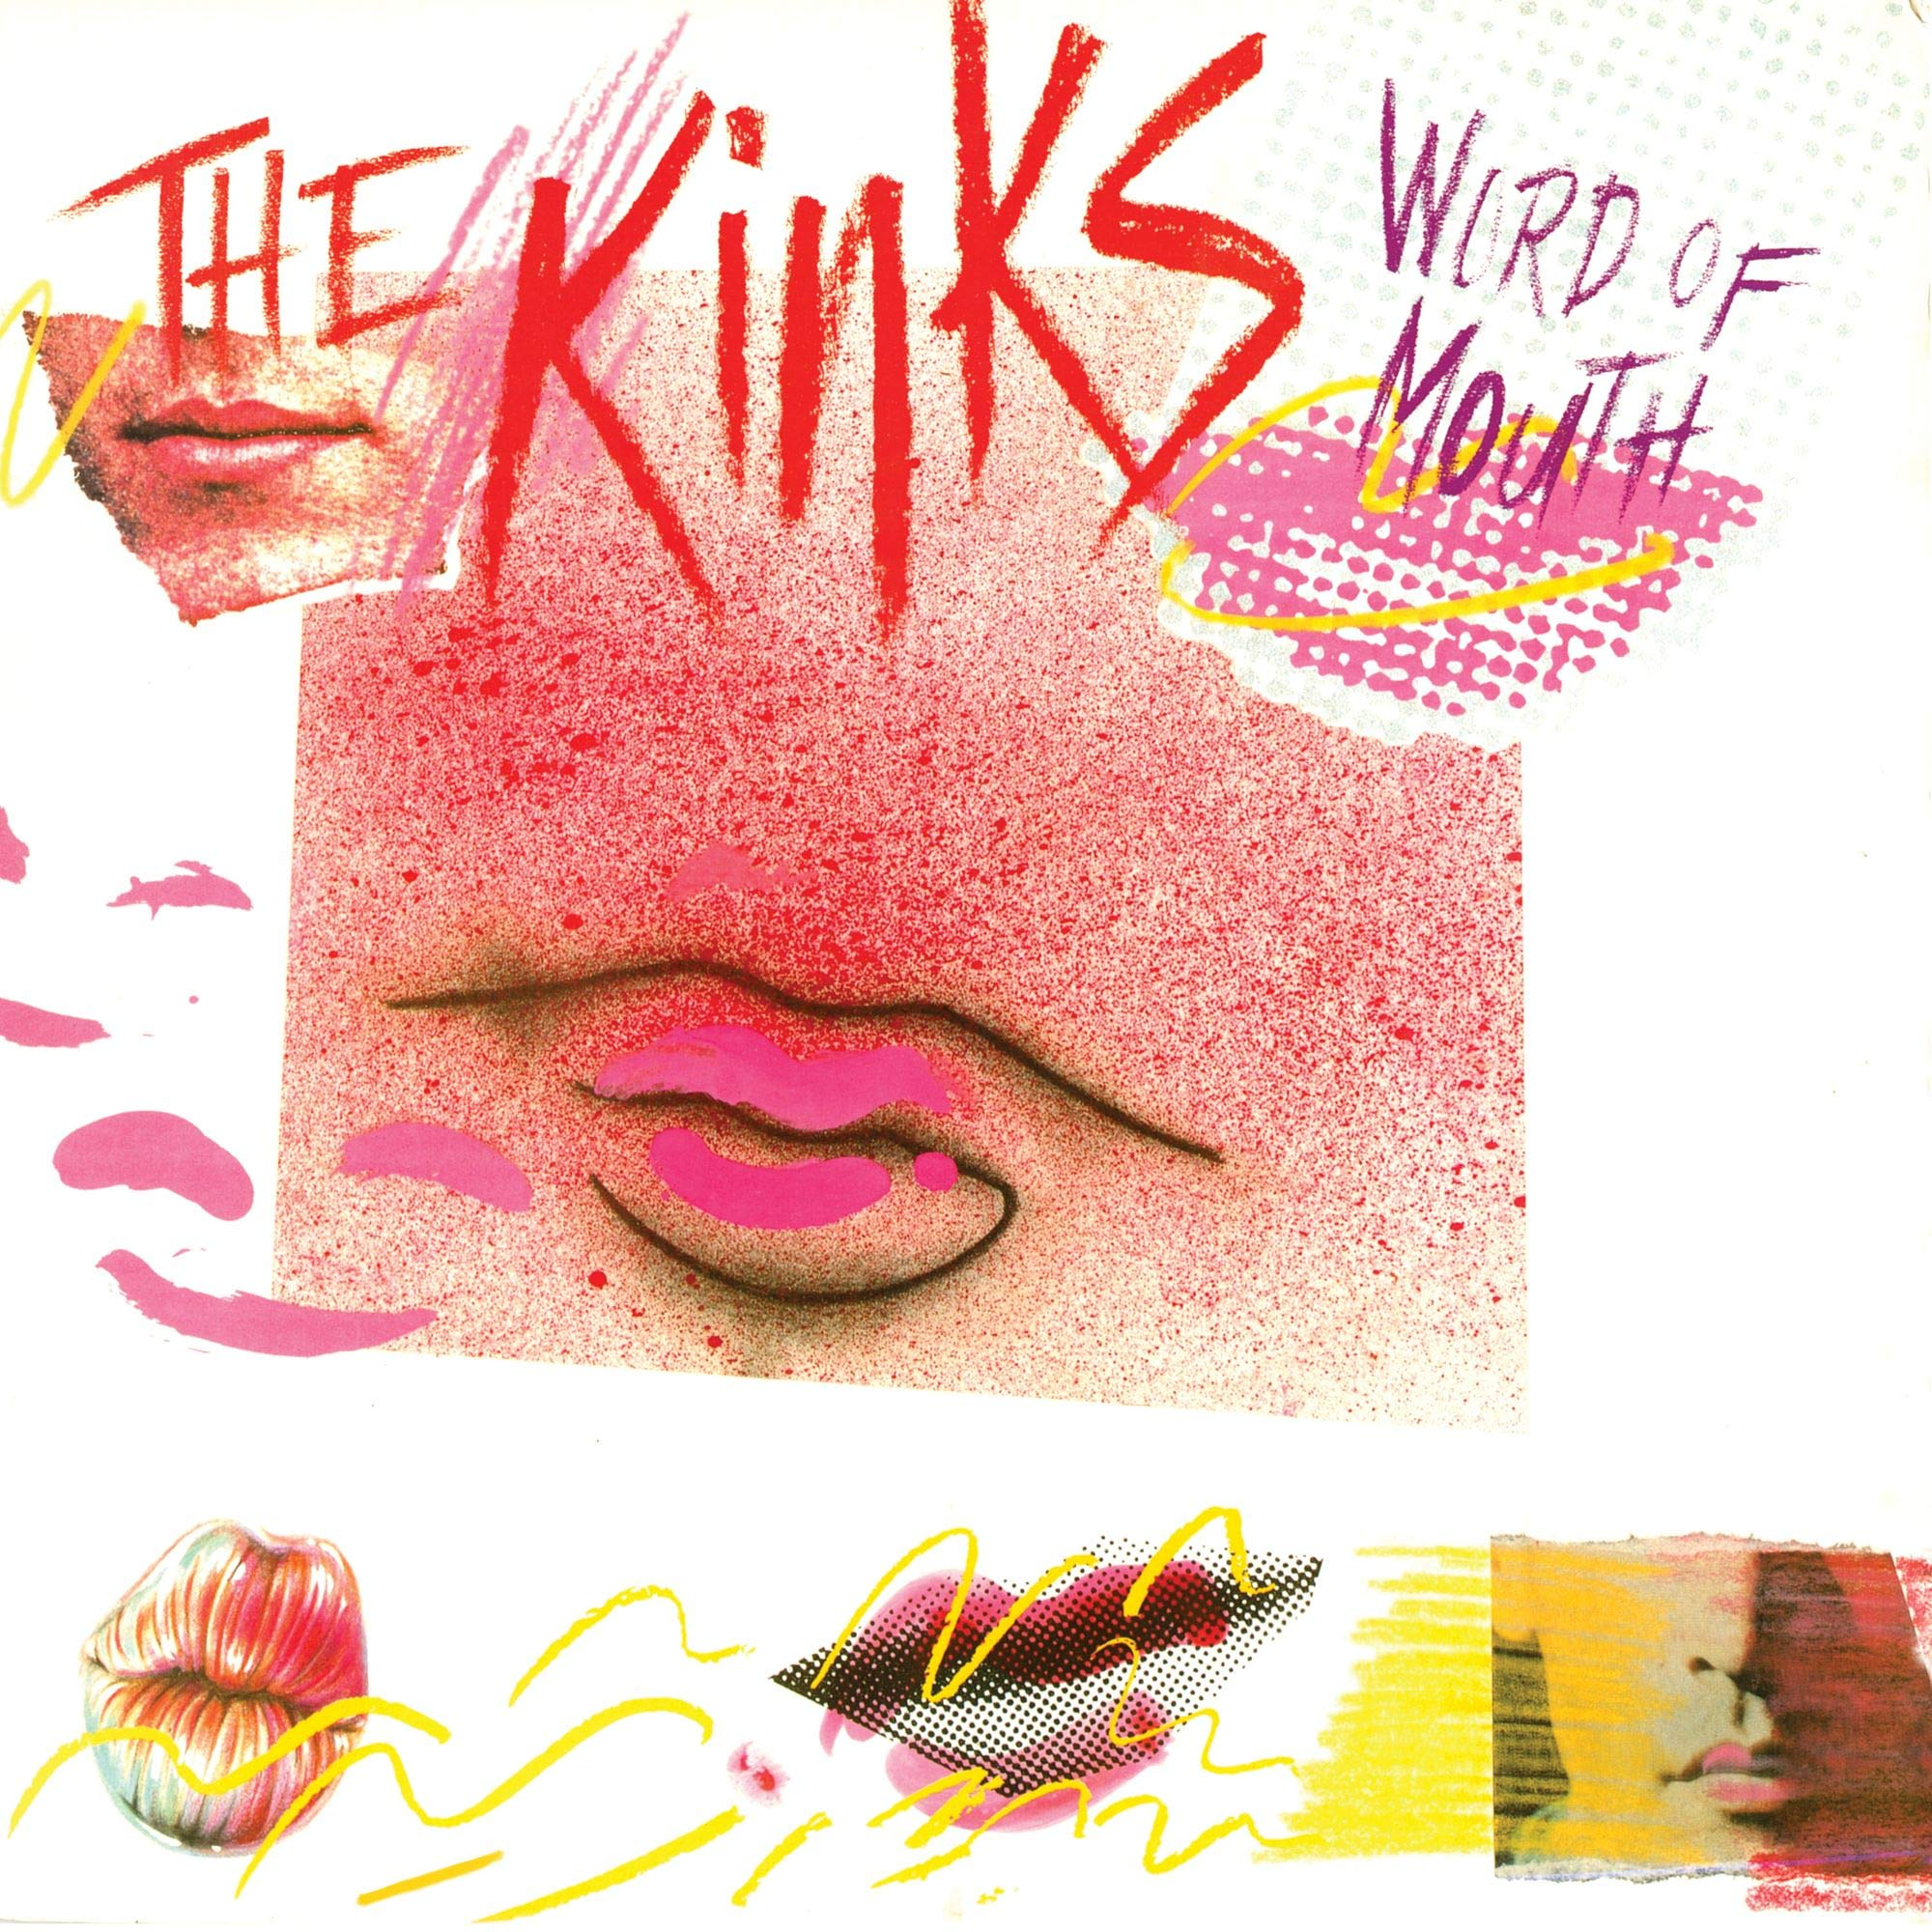 Vinilo : The Kinks - Word Of Mouth (180 Gram Vinyl, Gatefold LP Jacket, Limited Edition, Colored Vinyl, Pink)